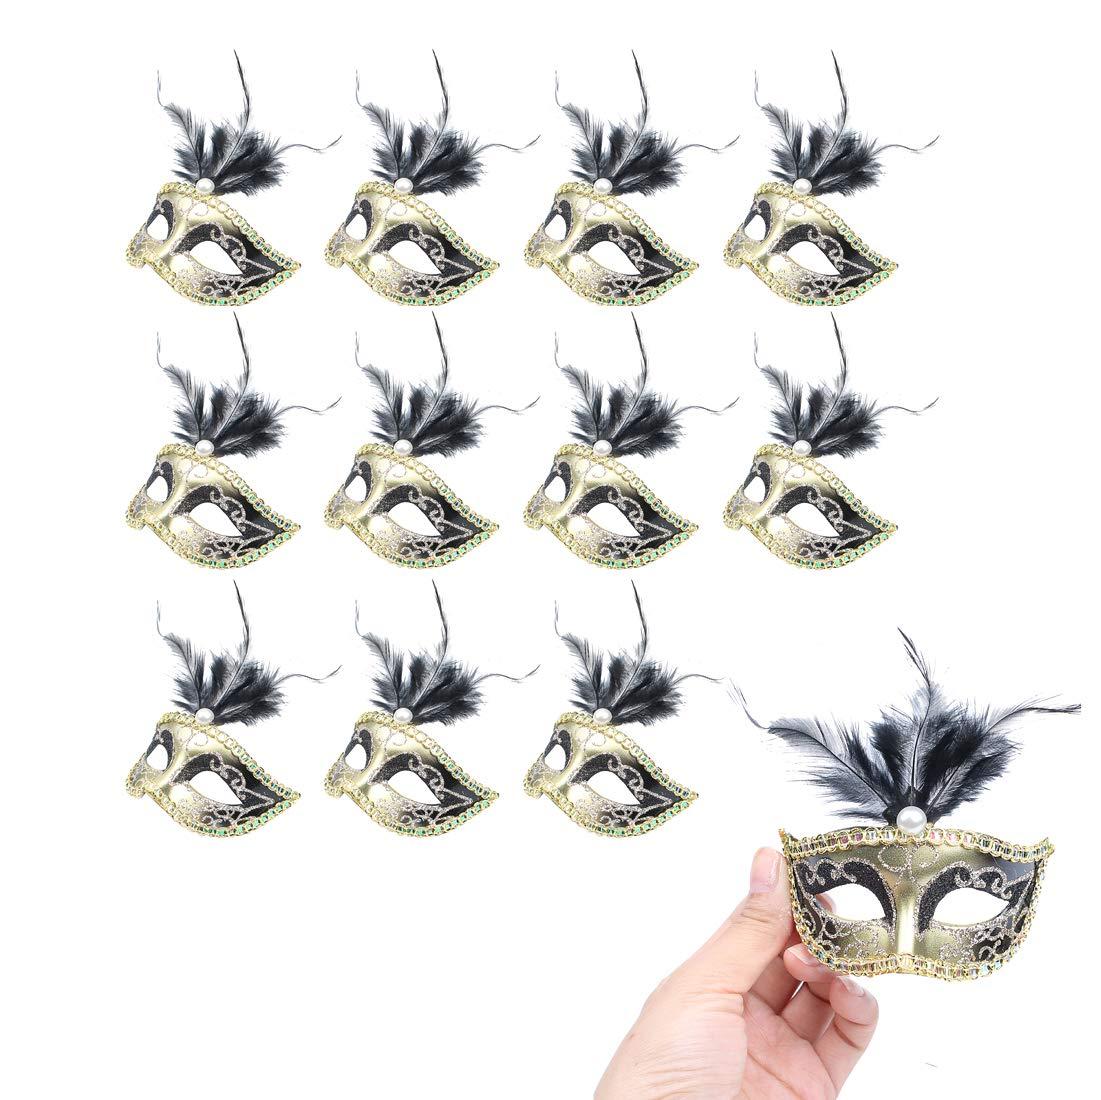 Hophen 24 Pieces Decorative Mini Masquerade Mask Party Decorations Luxury Feather Mardi Gras Venetian Mask Party Favors (Black)